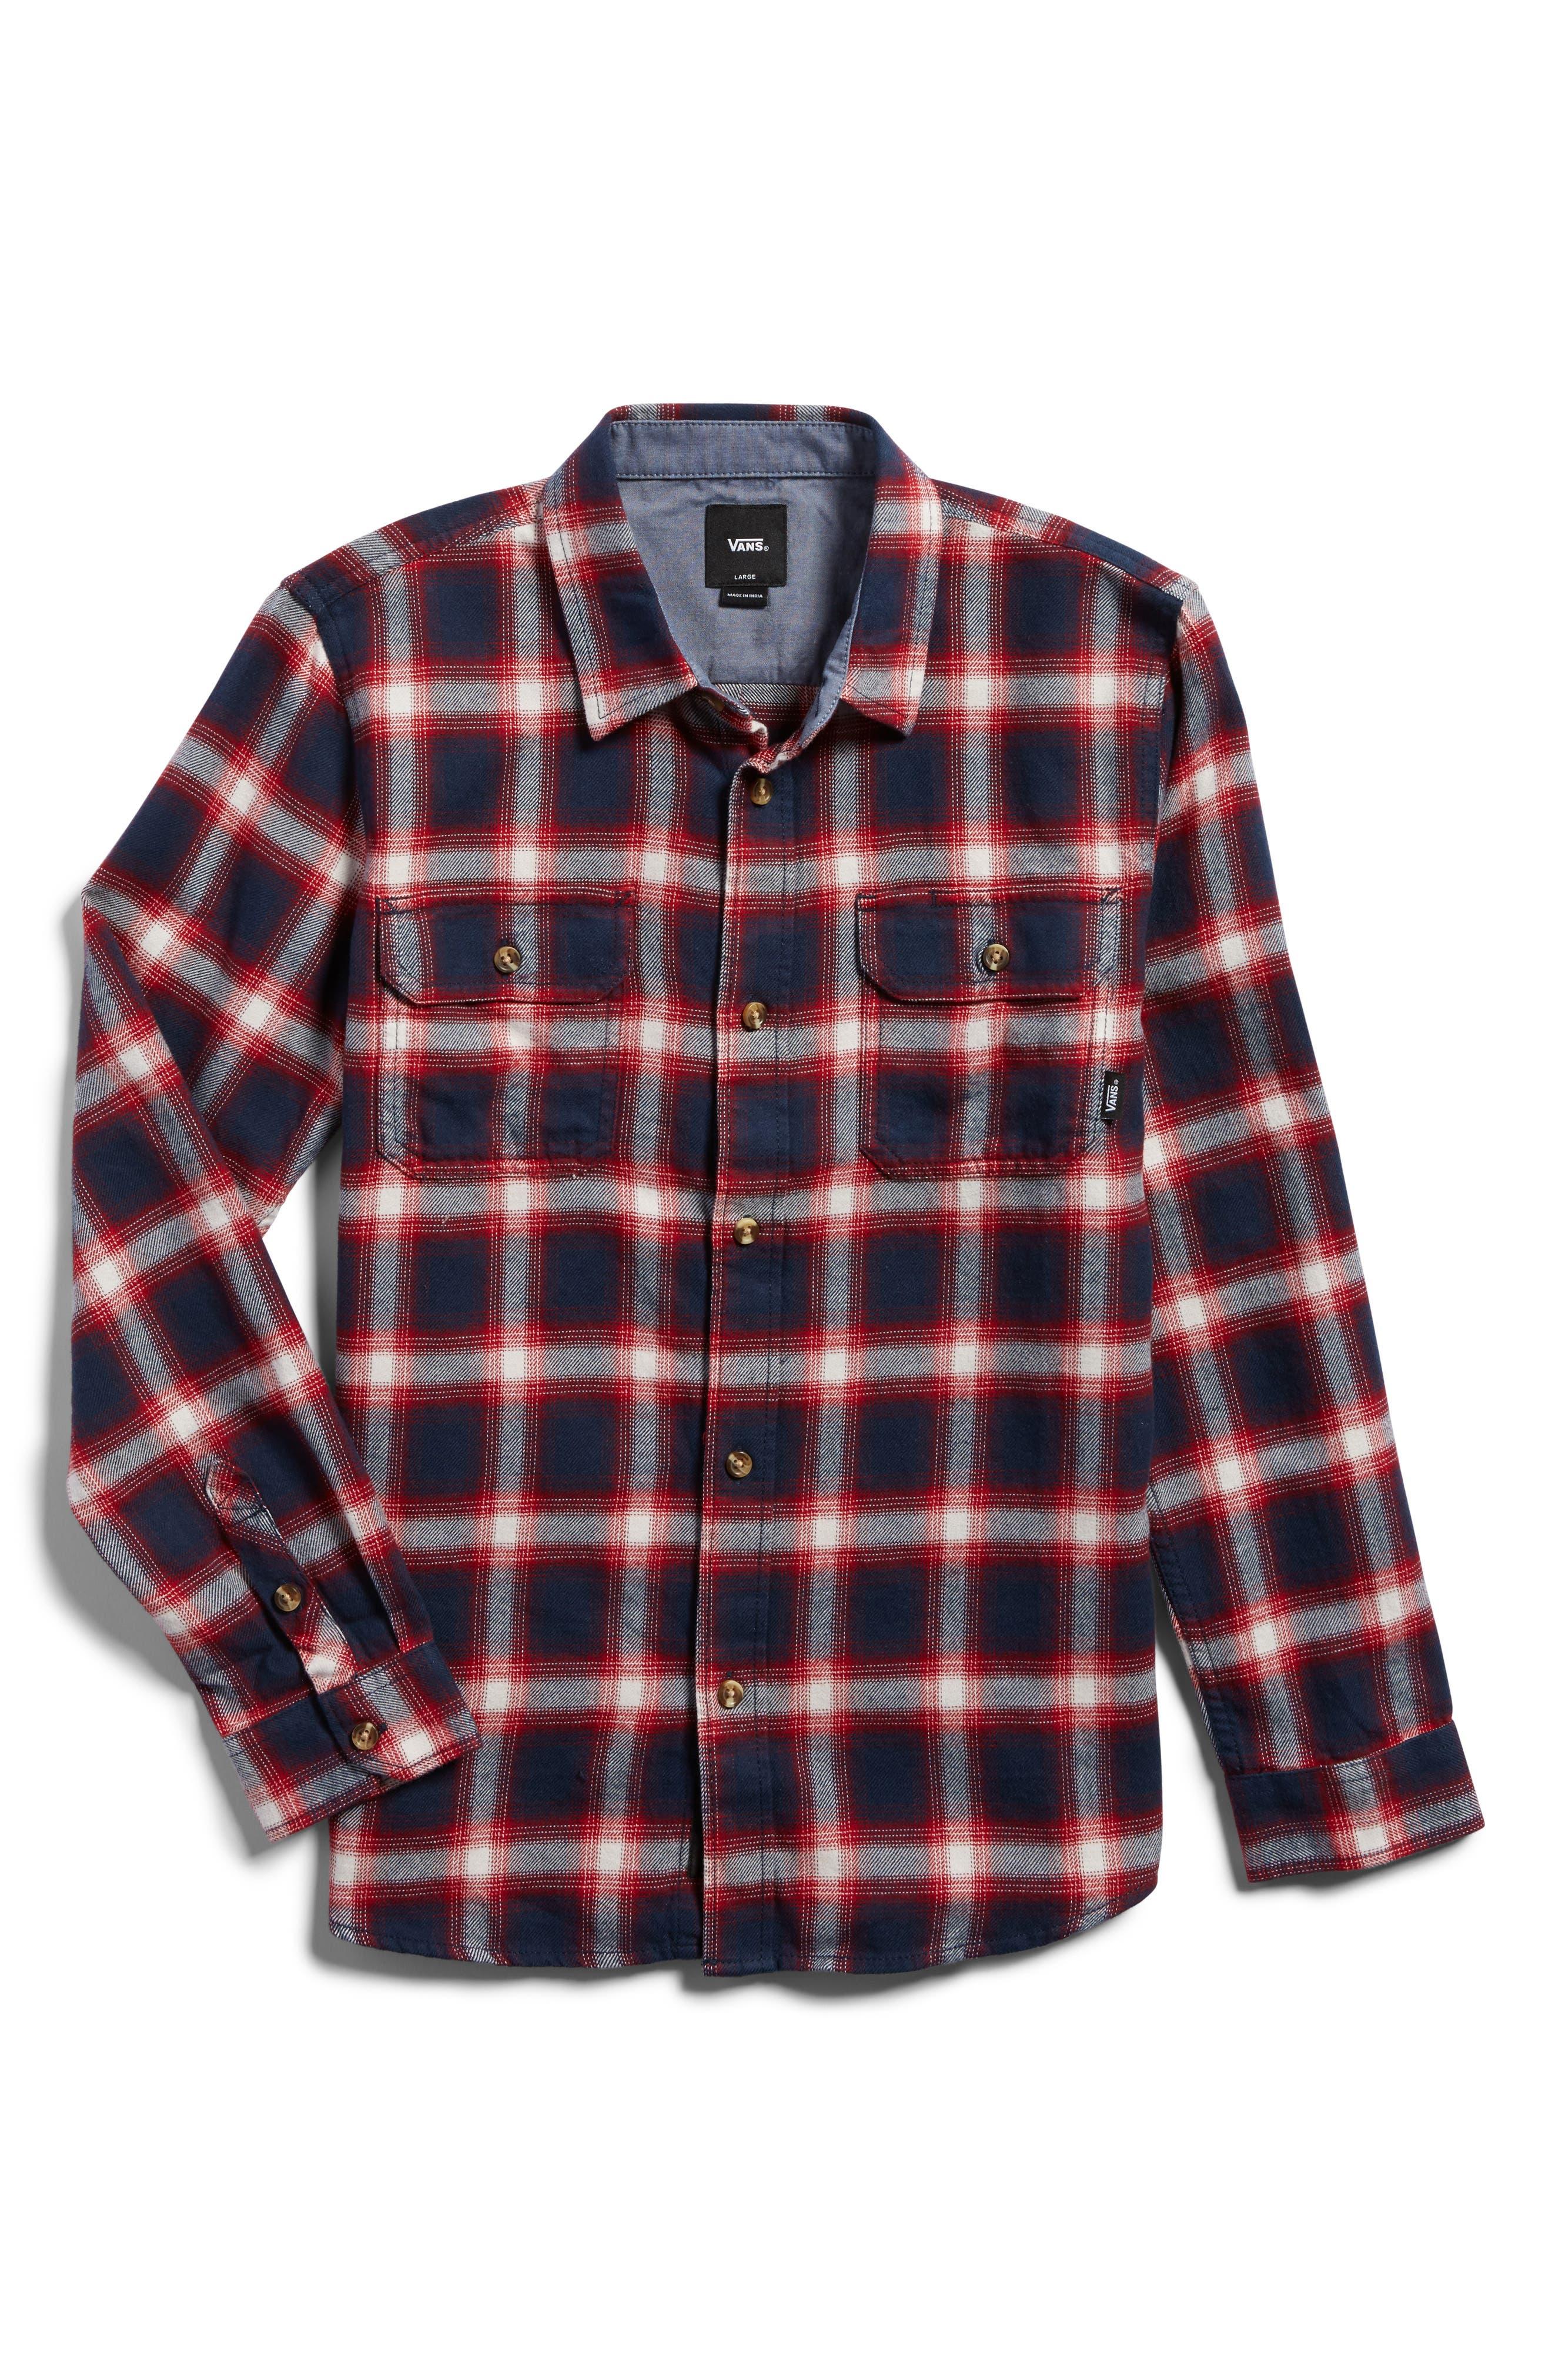 Beechwood Plaid Flannel Shirt,                             Main thumbnail 1, color,                             Dress Blues/ Chili Pepper